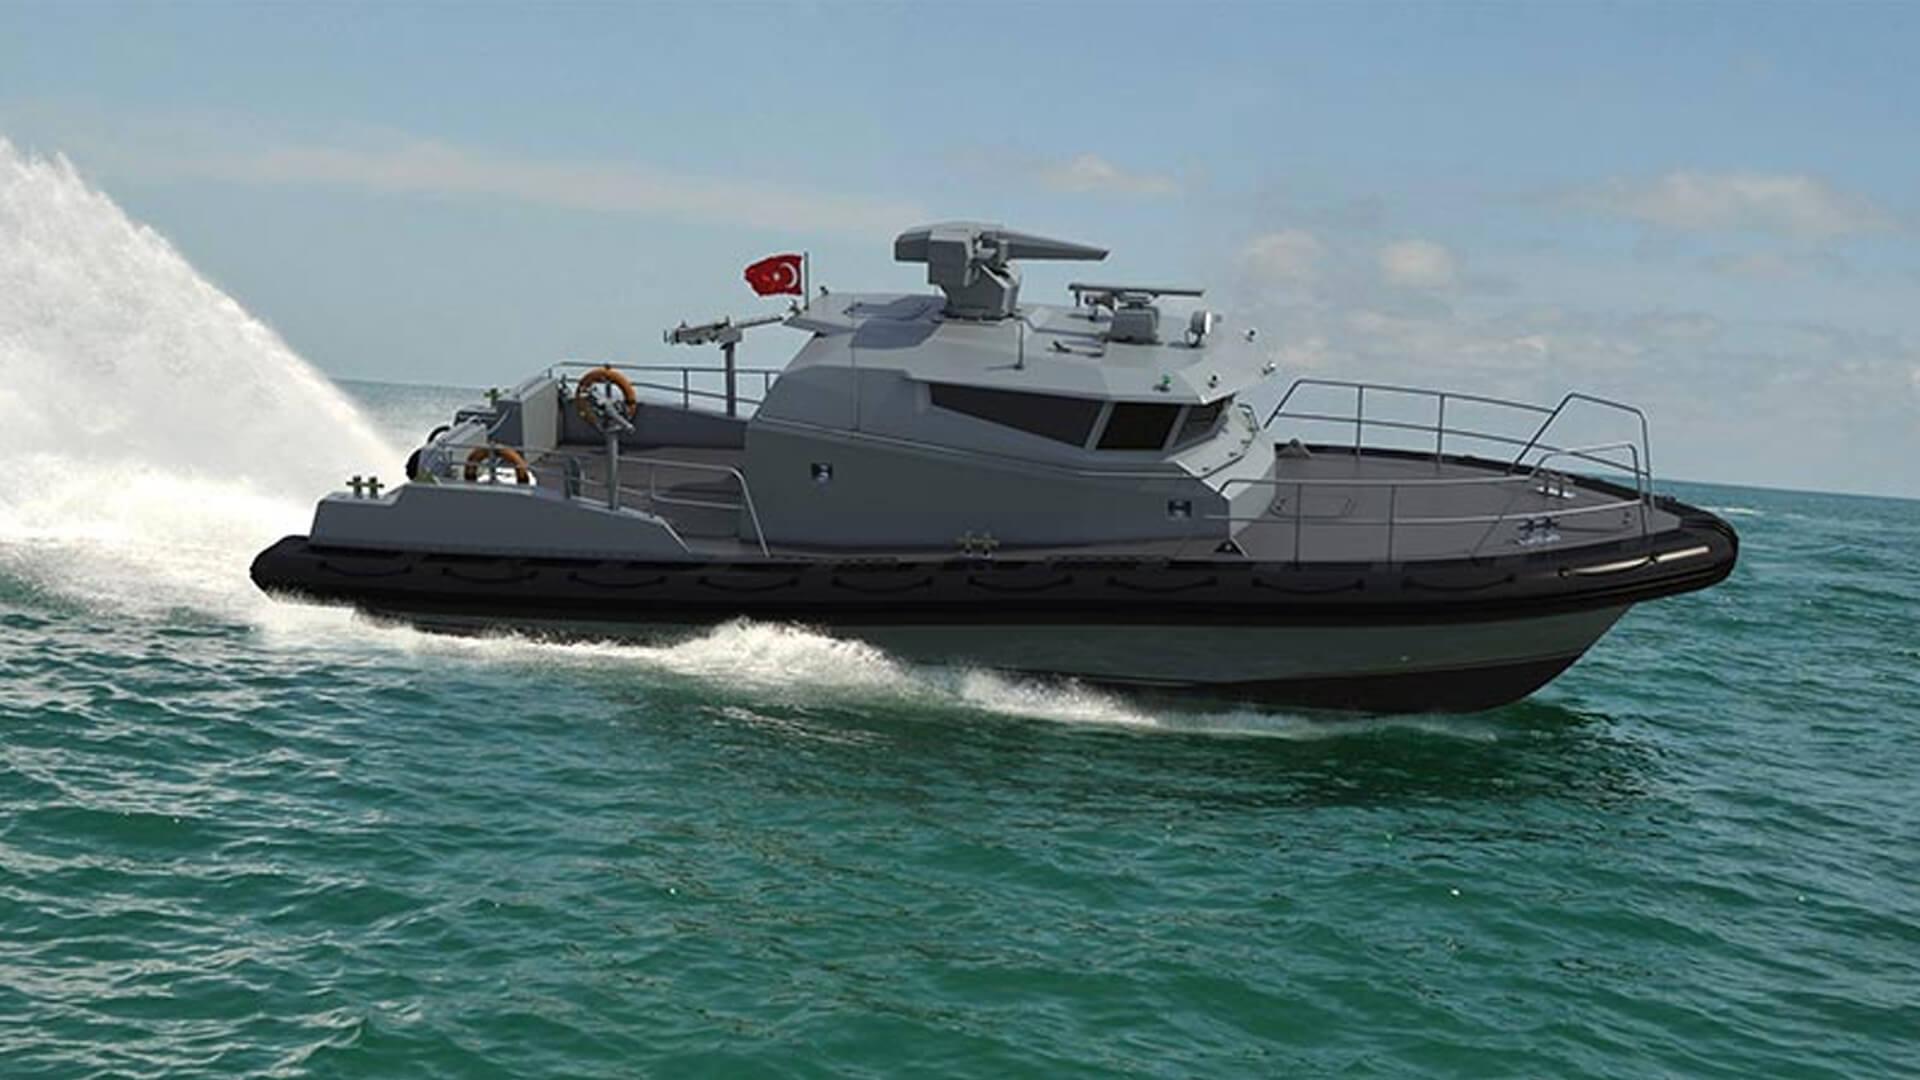 images/vessels/01-patrol-craft/05-series-fpb/05-ares-42-fpb/01.jpg